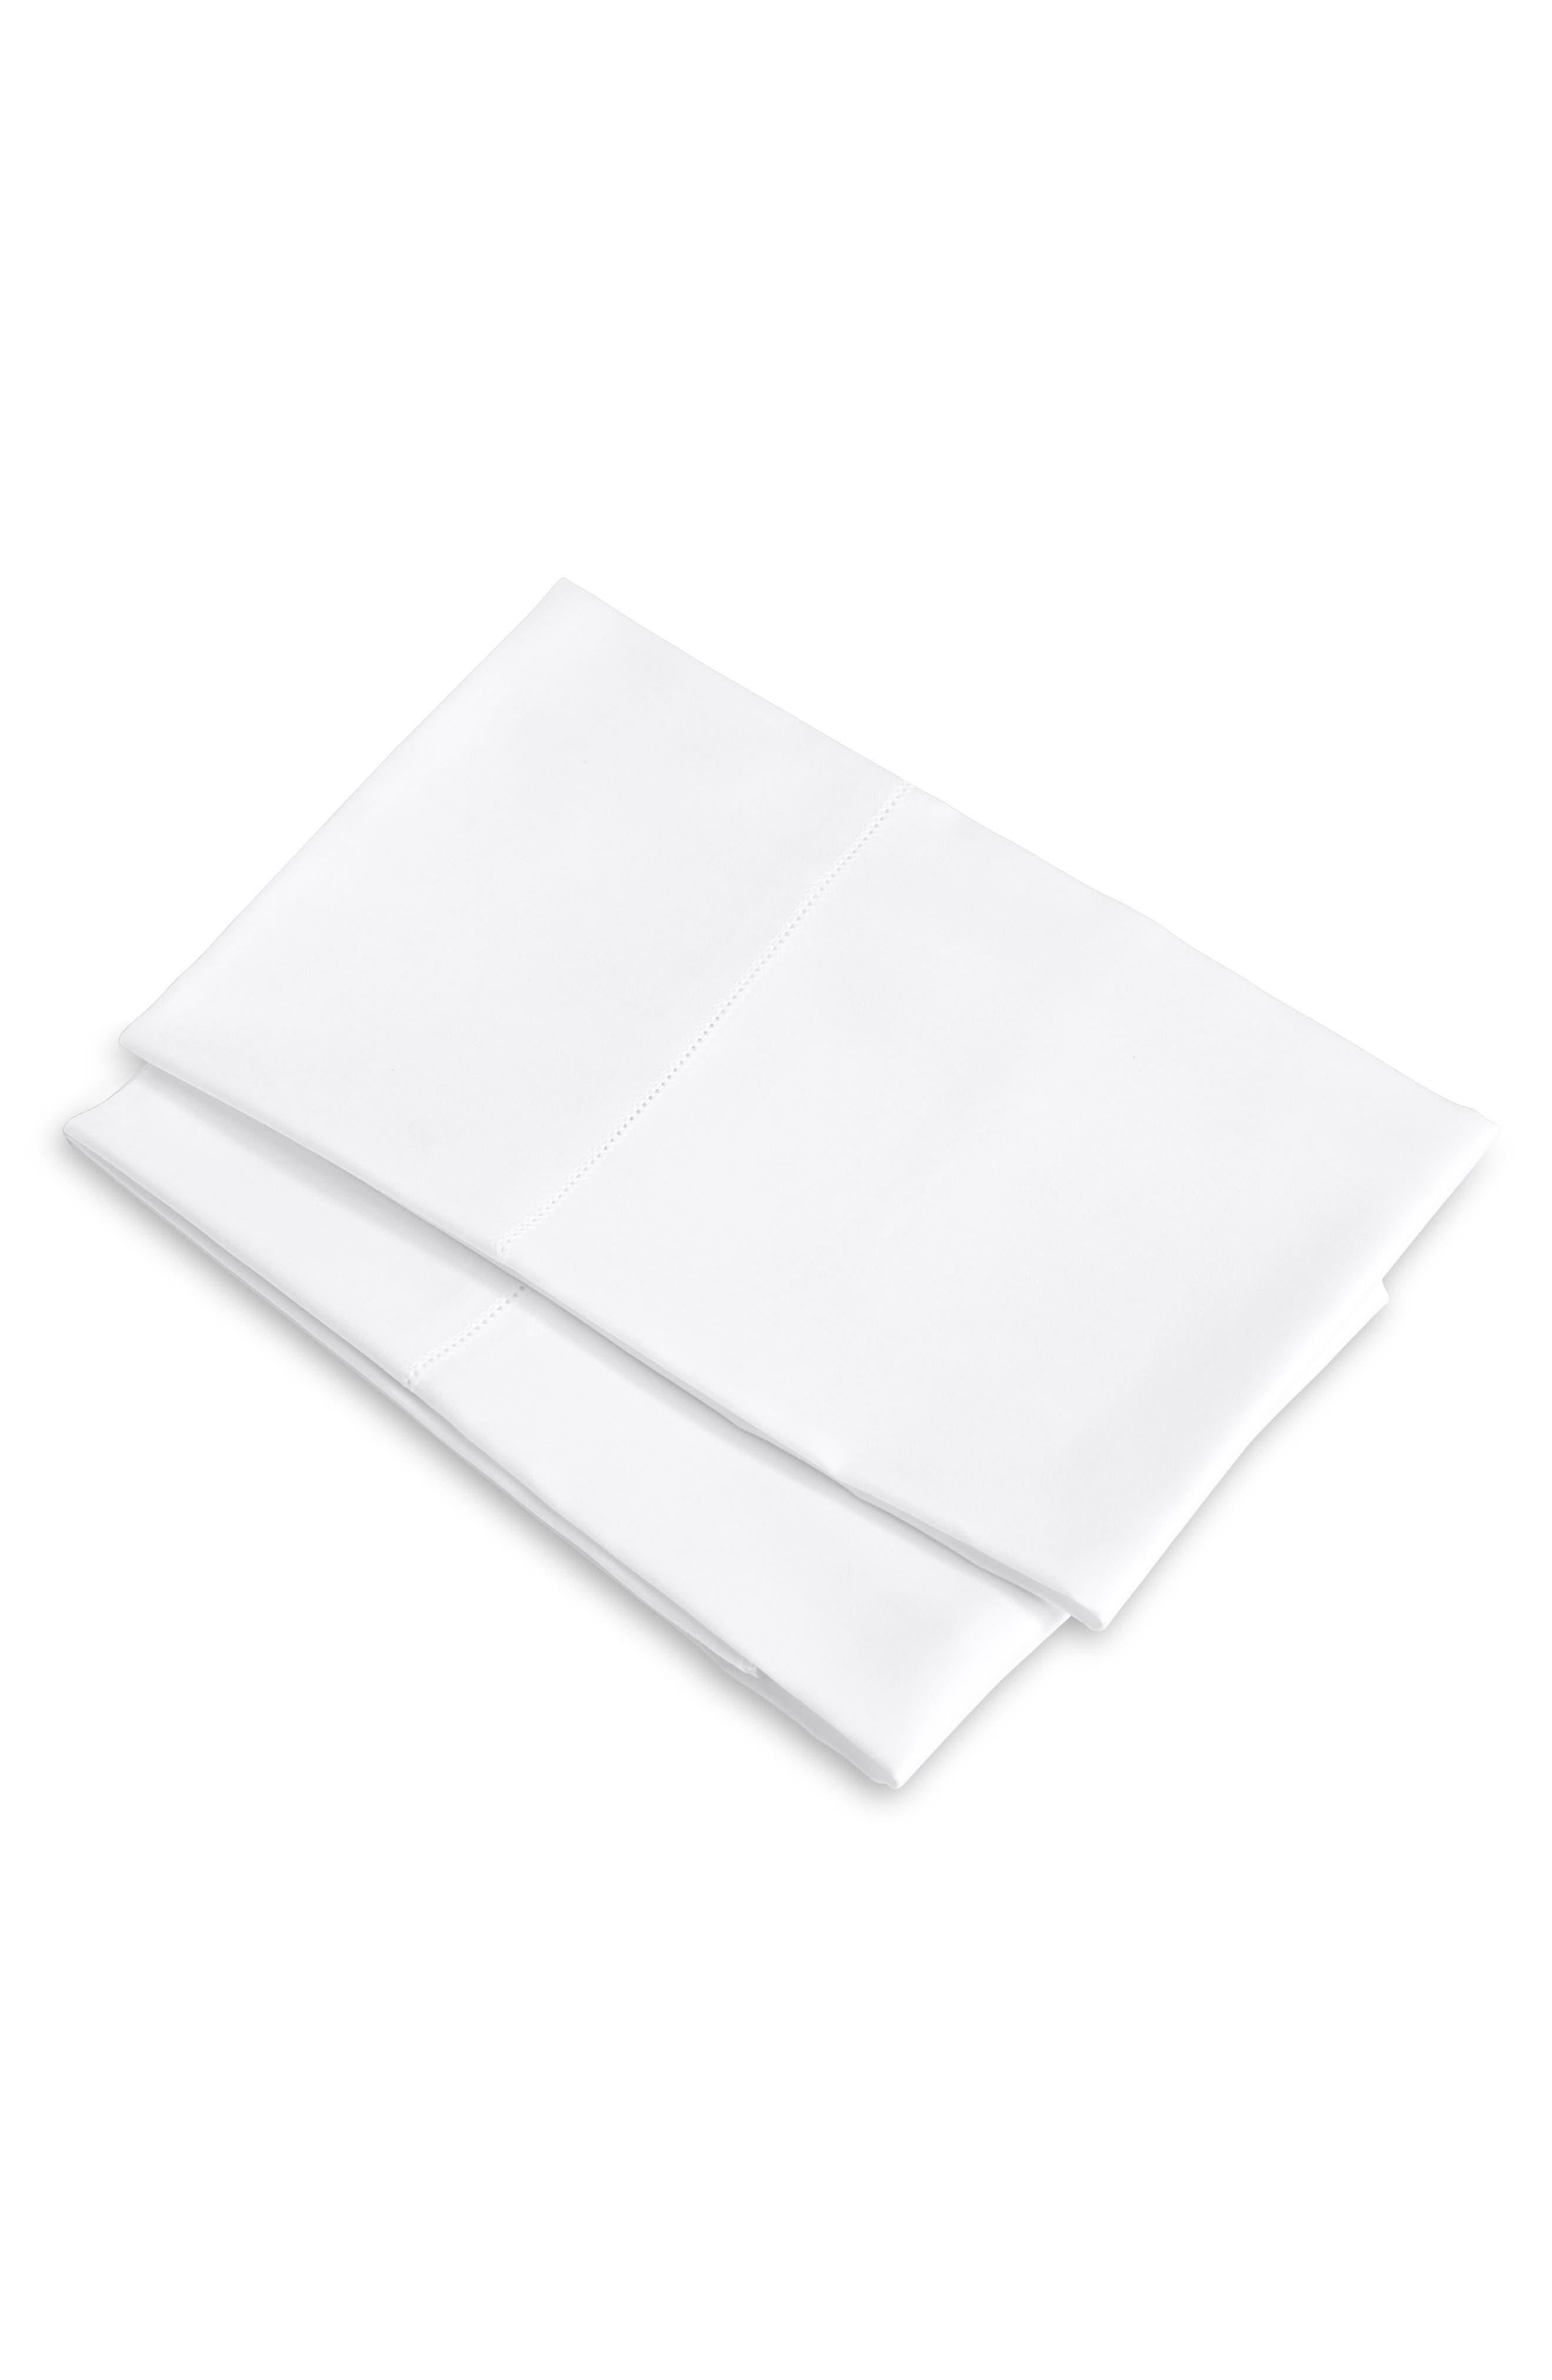 SIGNORIA FIRENZE Tuscan Dreams 400 Thread Count Set of 2 Pillowcases, Main, color, WHITE